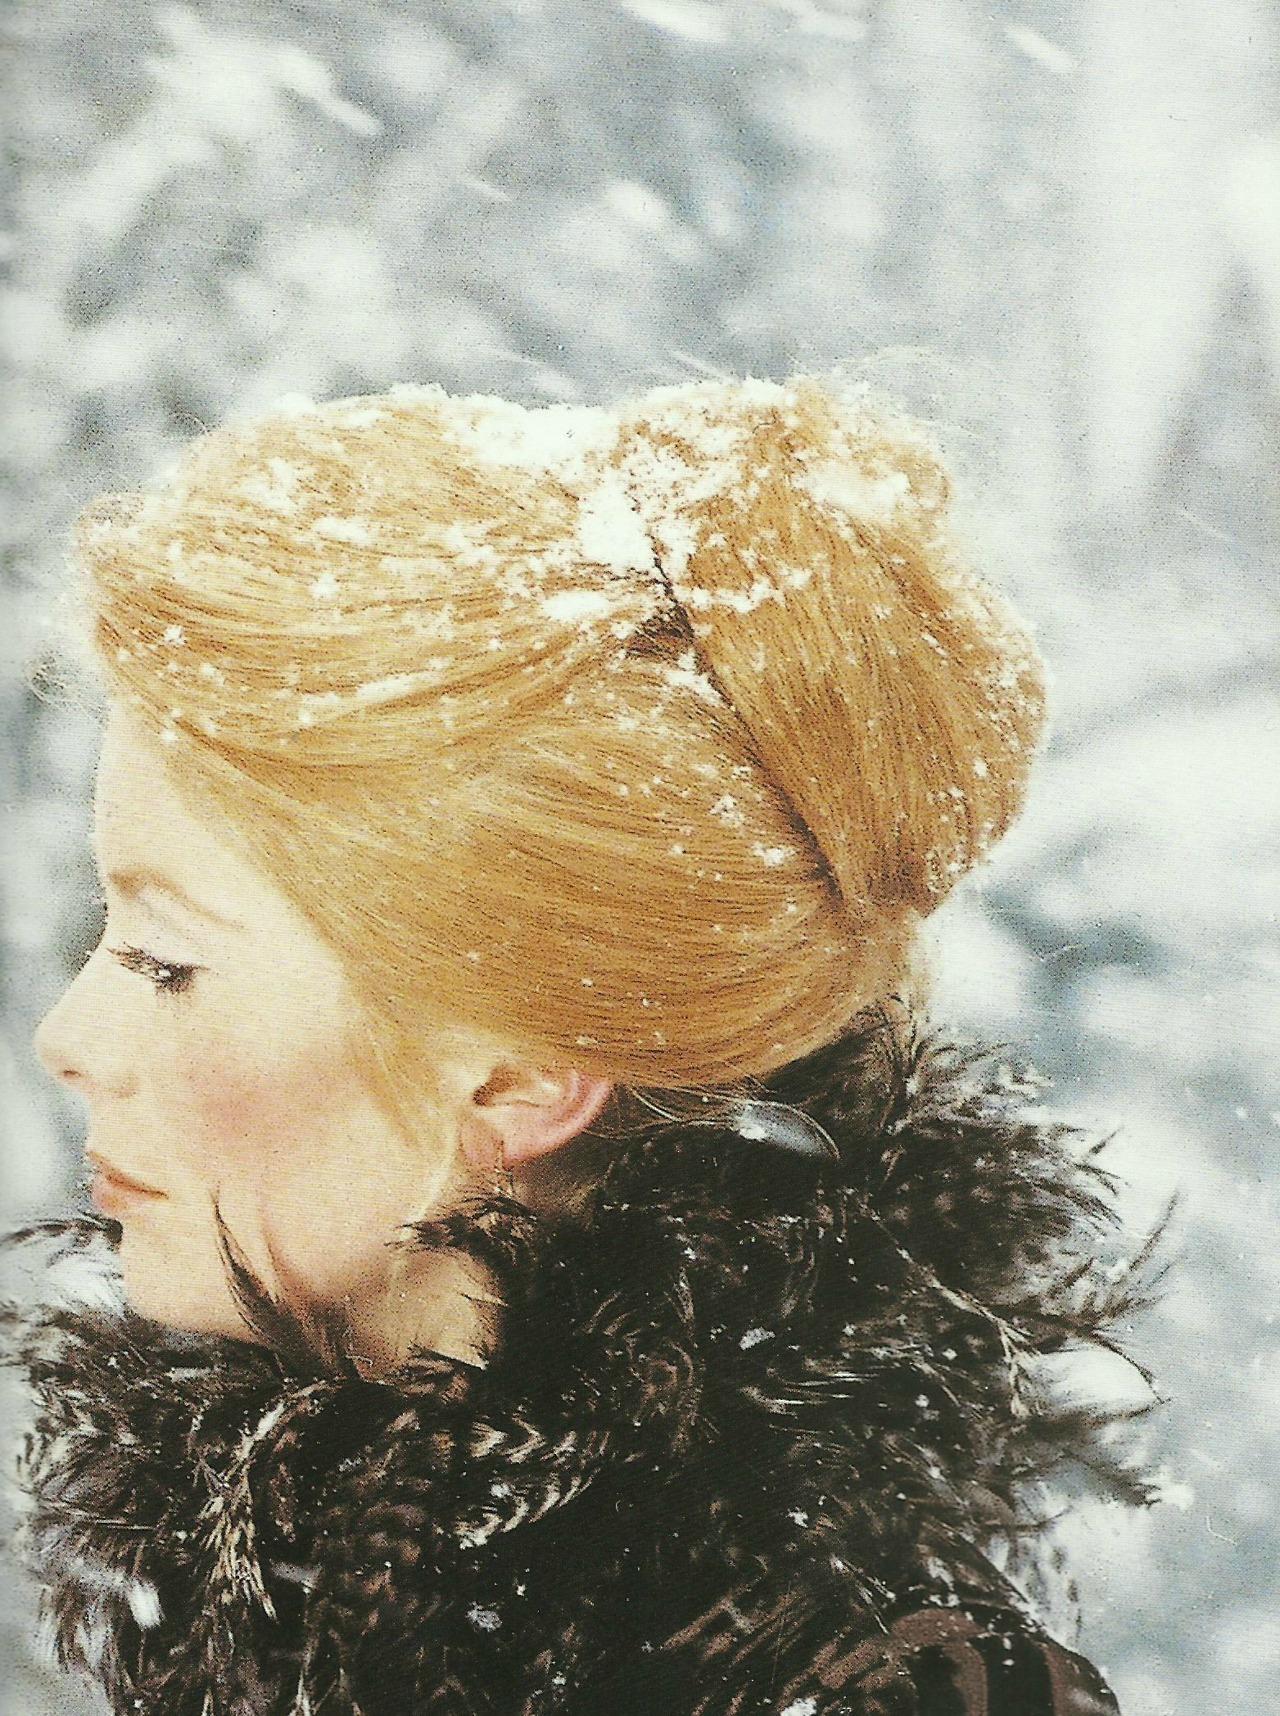 Catherine Deneuve in a still from La Sirene Du Mississippi [Mississippi Mermaid] (1969)    Dir: François Truffaut